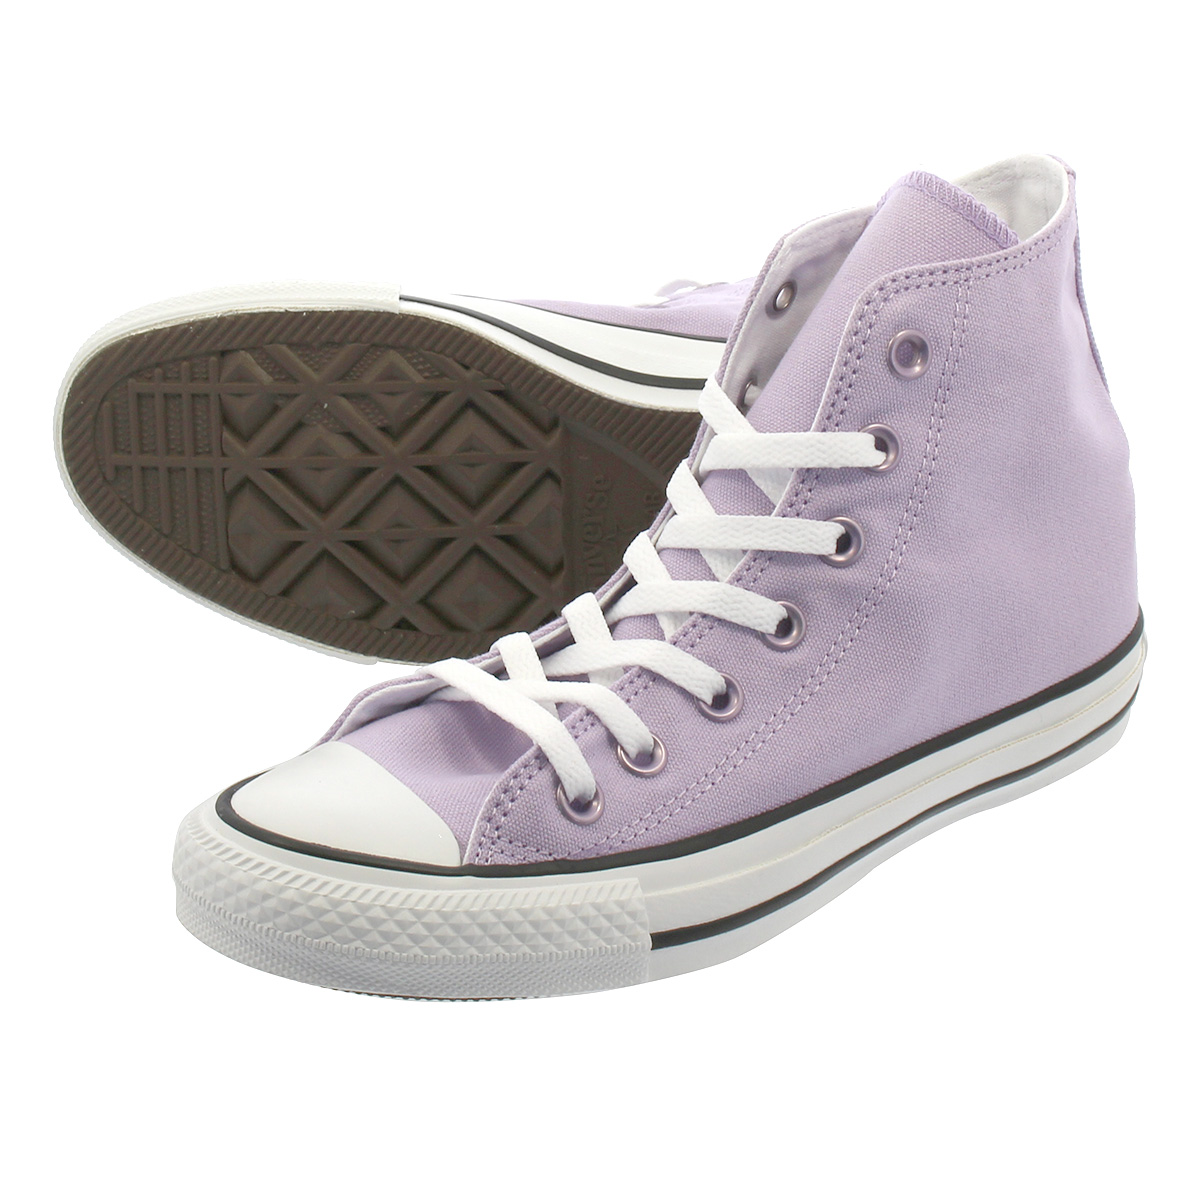 2converse violette